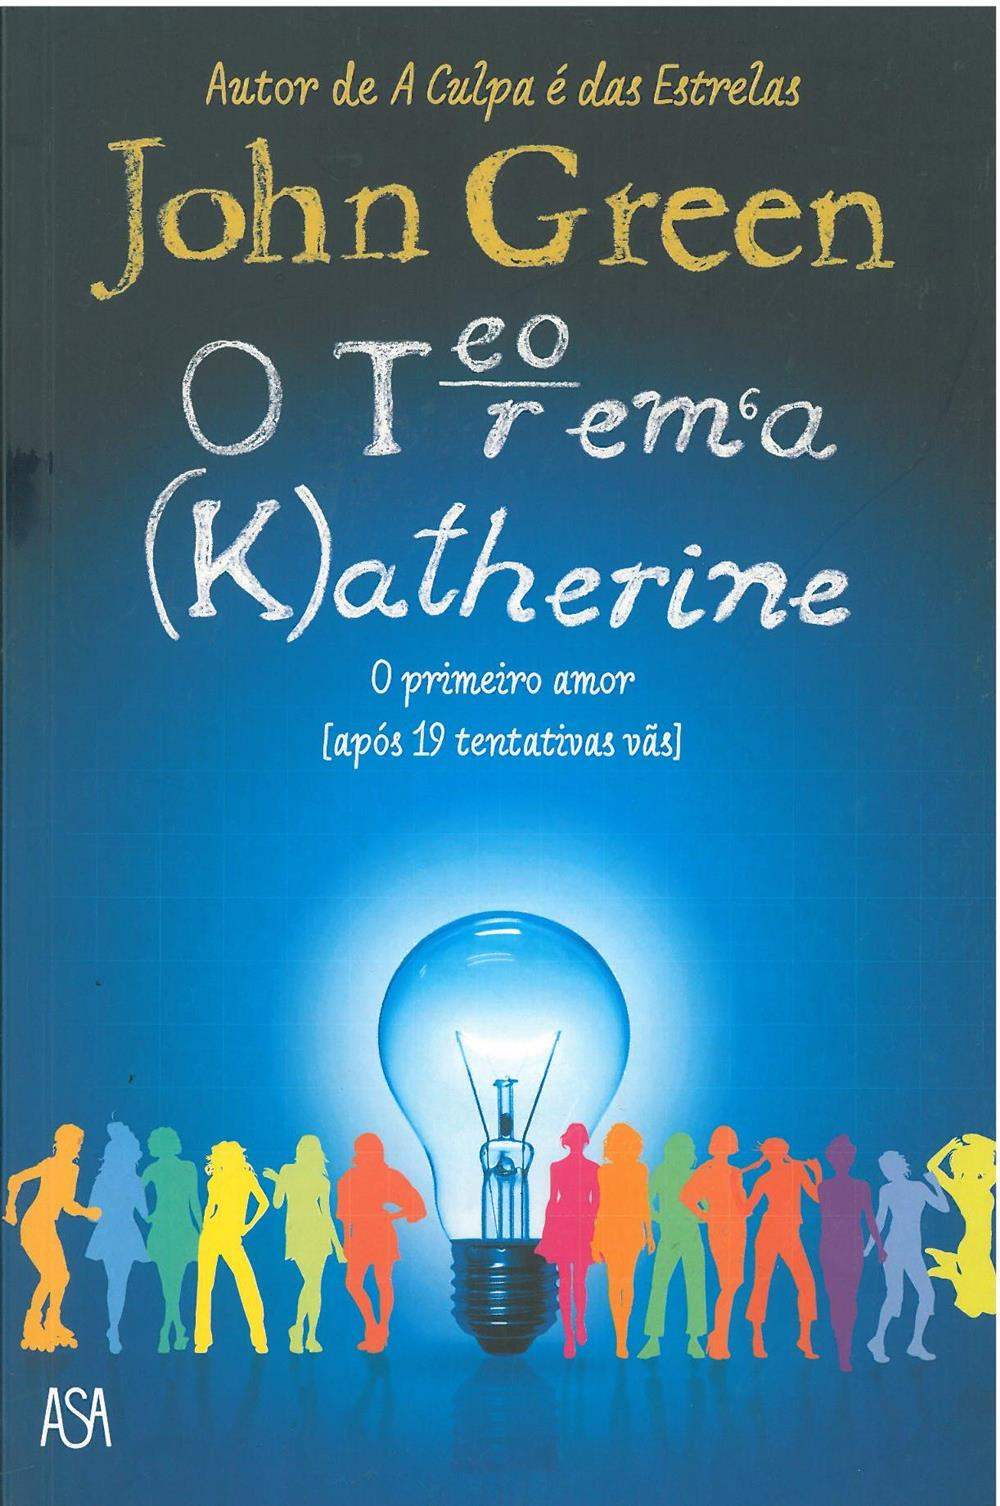 O teorema Katherine_.jpg